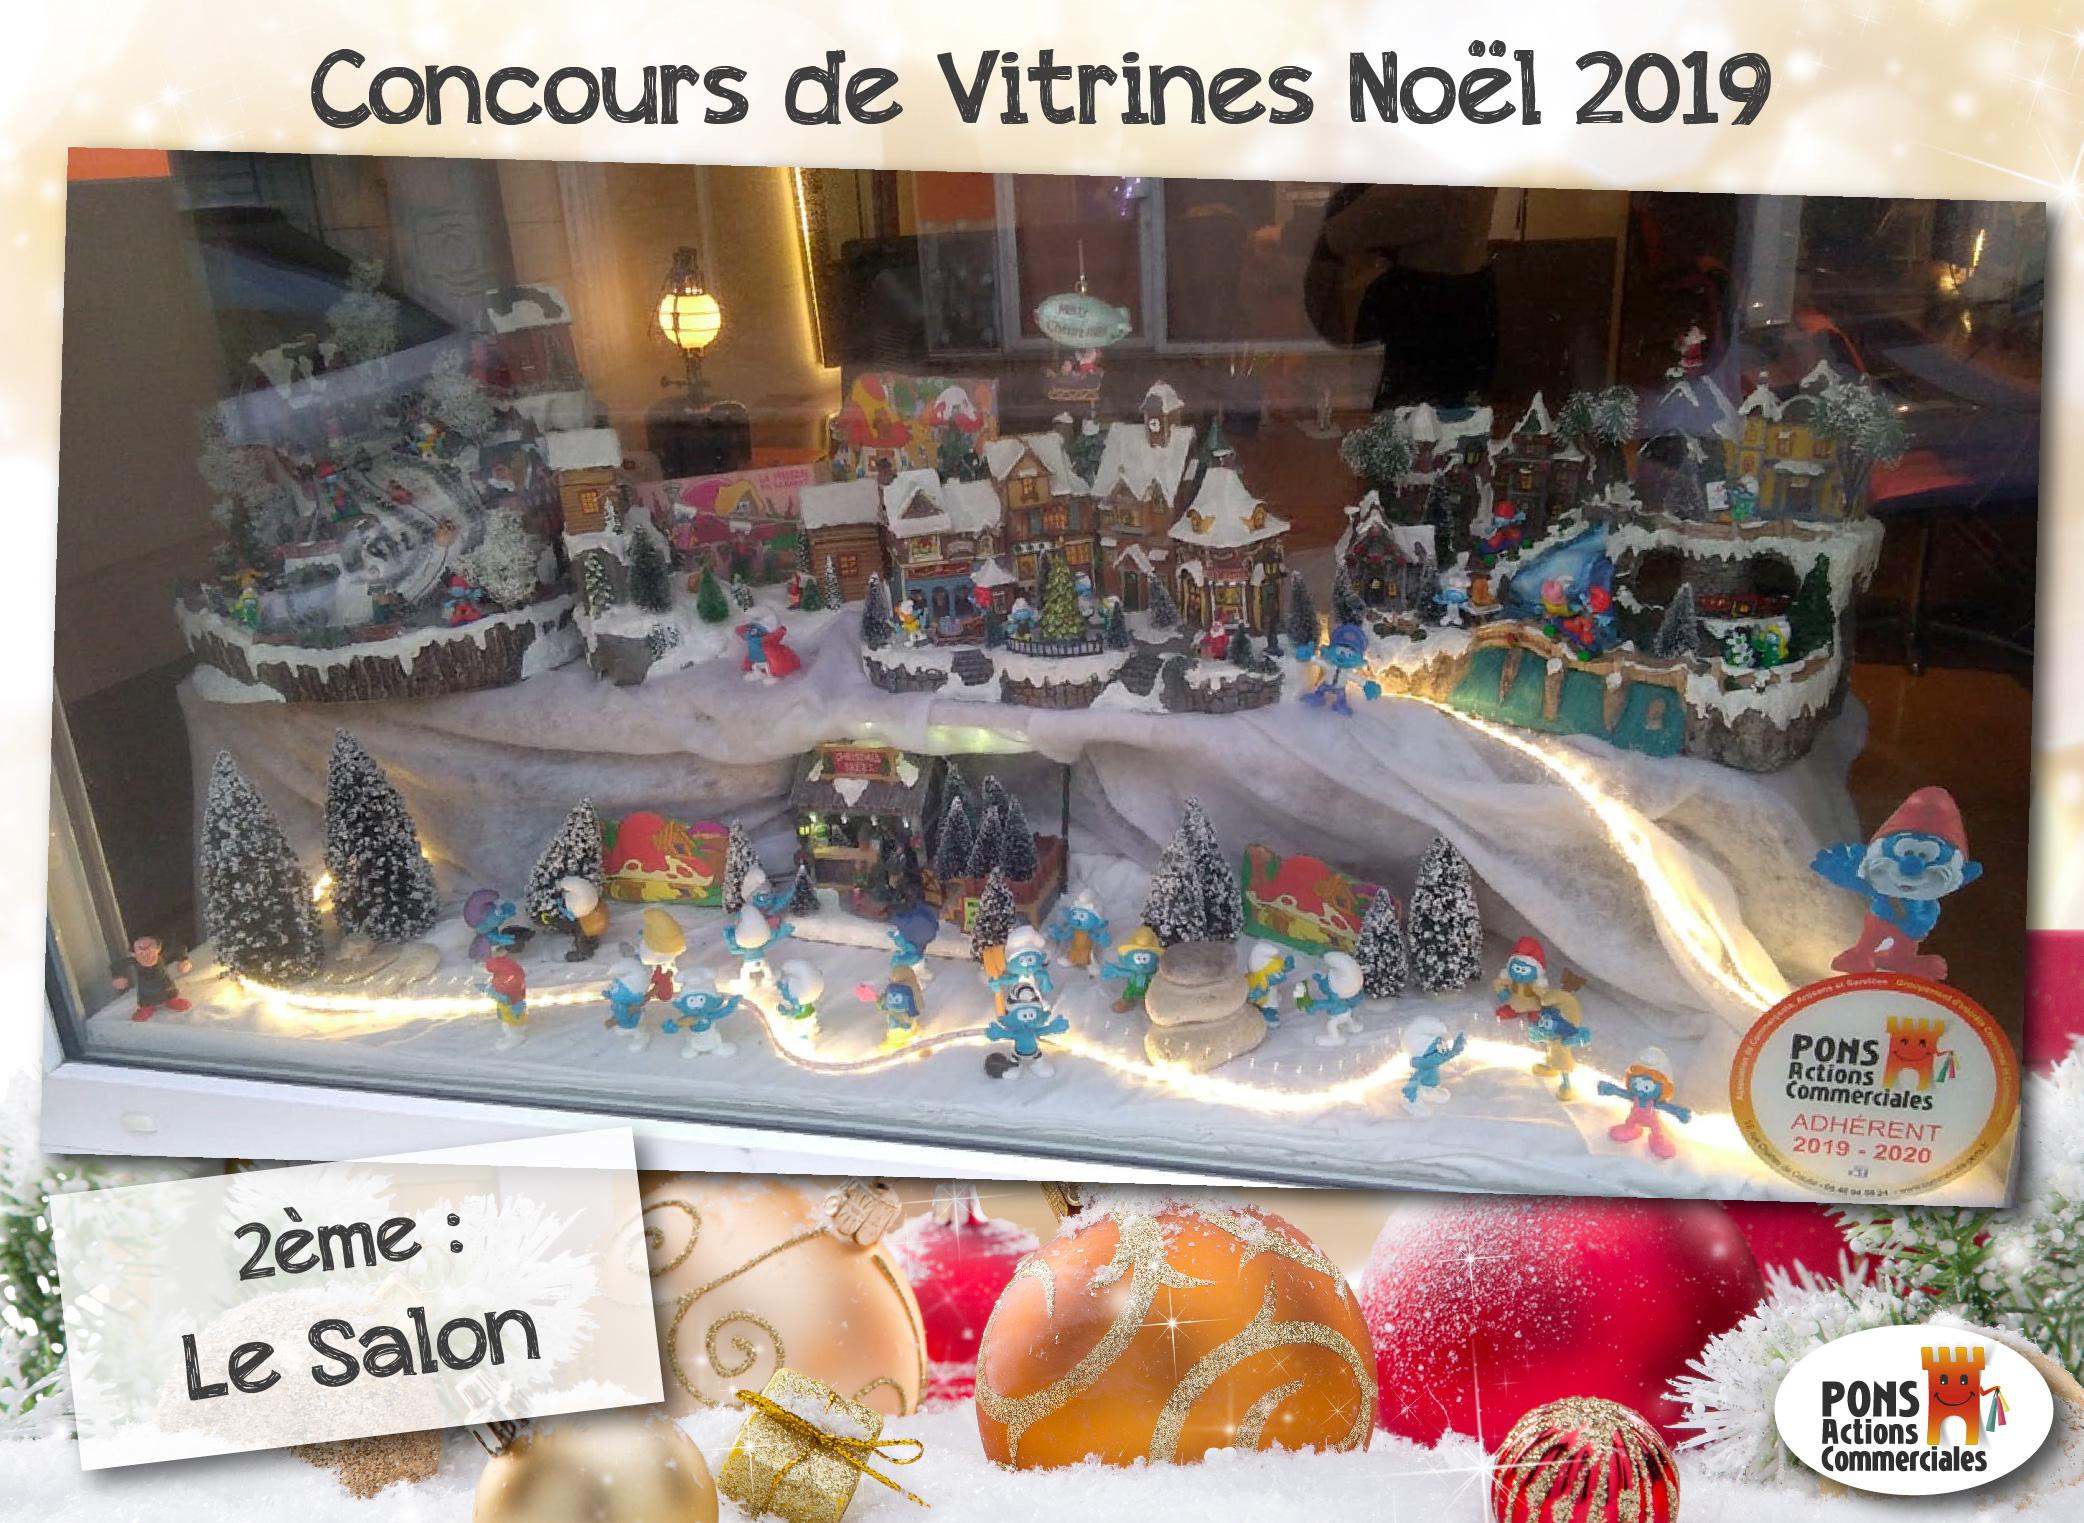 Pons Actions Commerciales - Vitrines2019-Gagnants - Le Salon